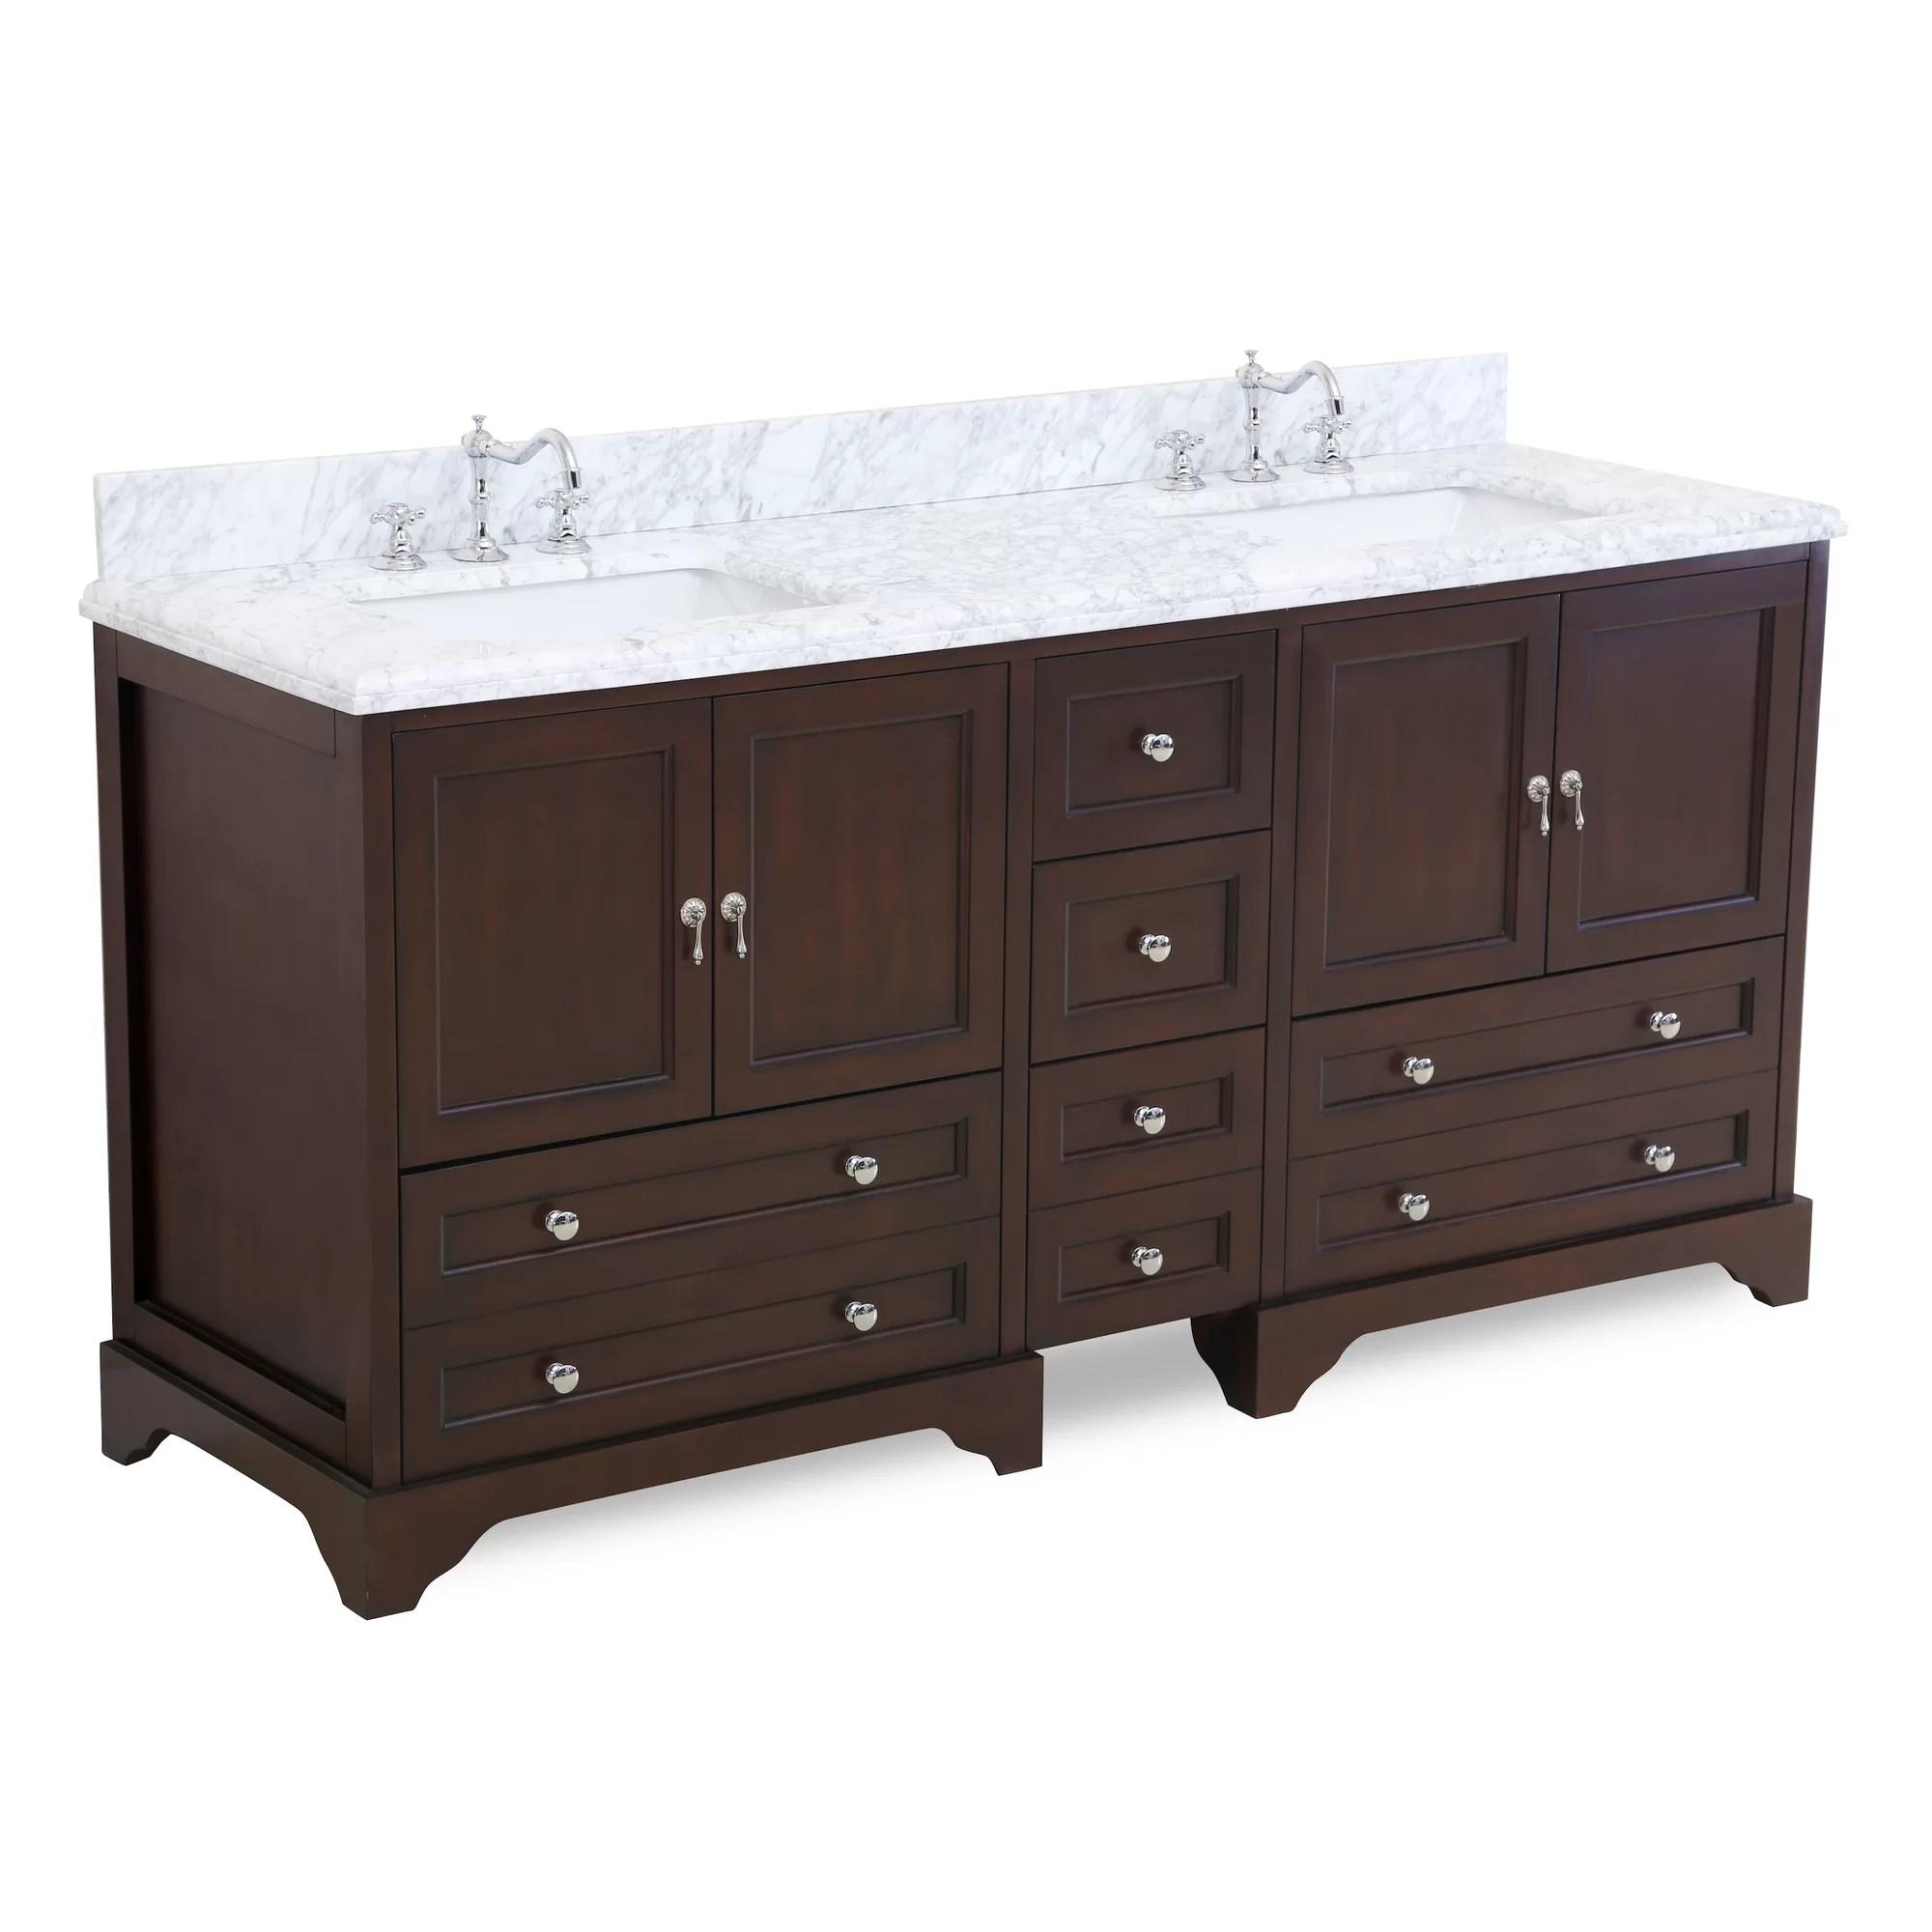 Kitchen Bath Collection Madison 72 Double Bathroom Vanity